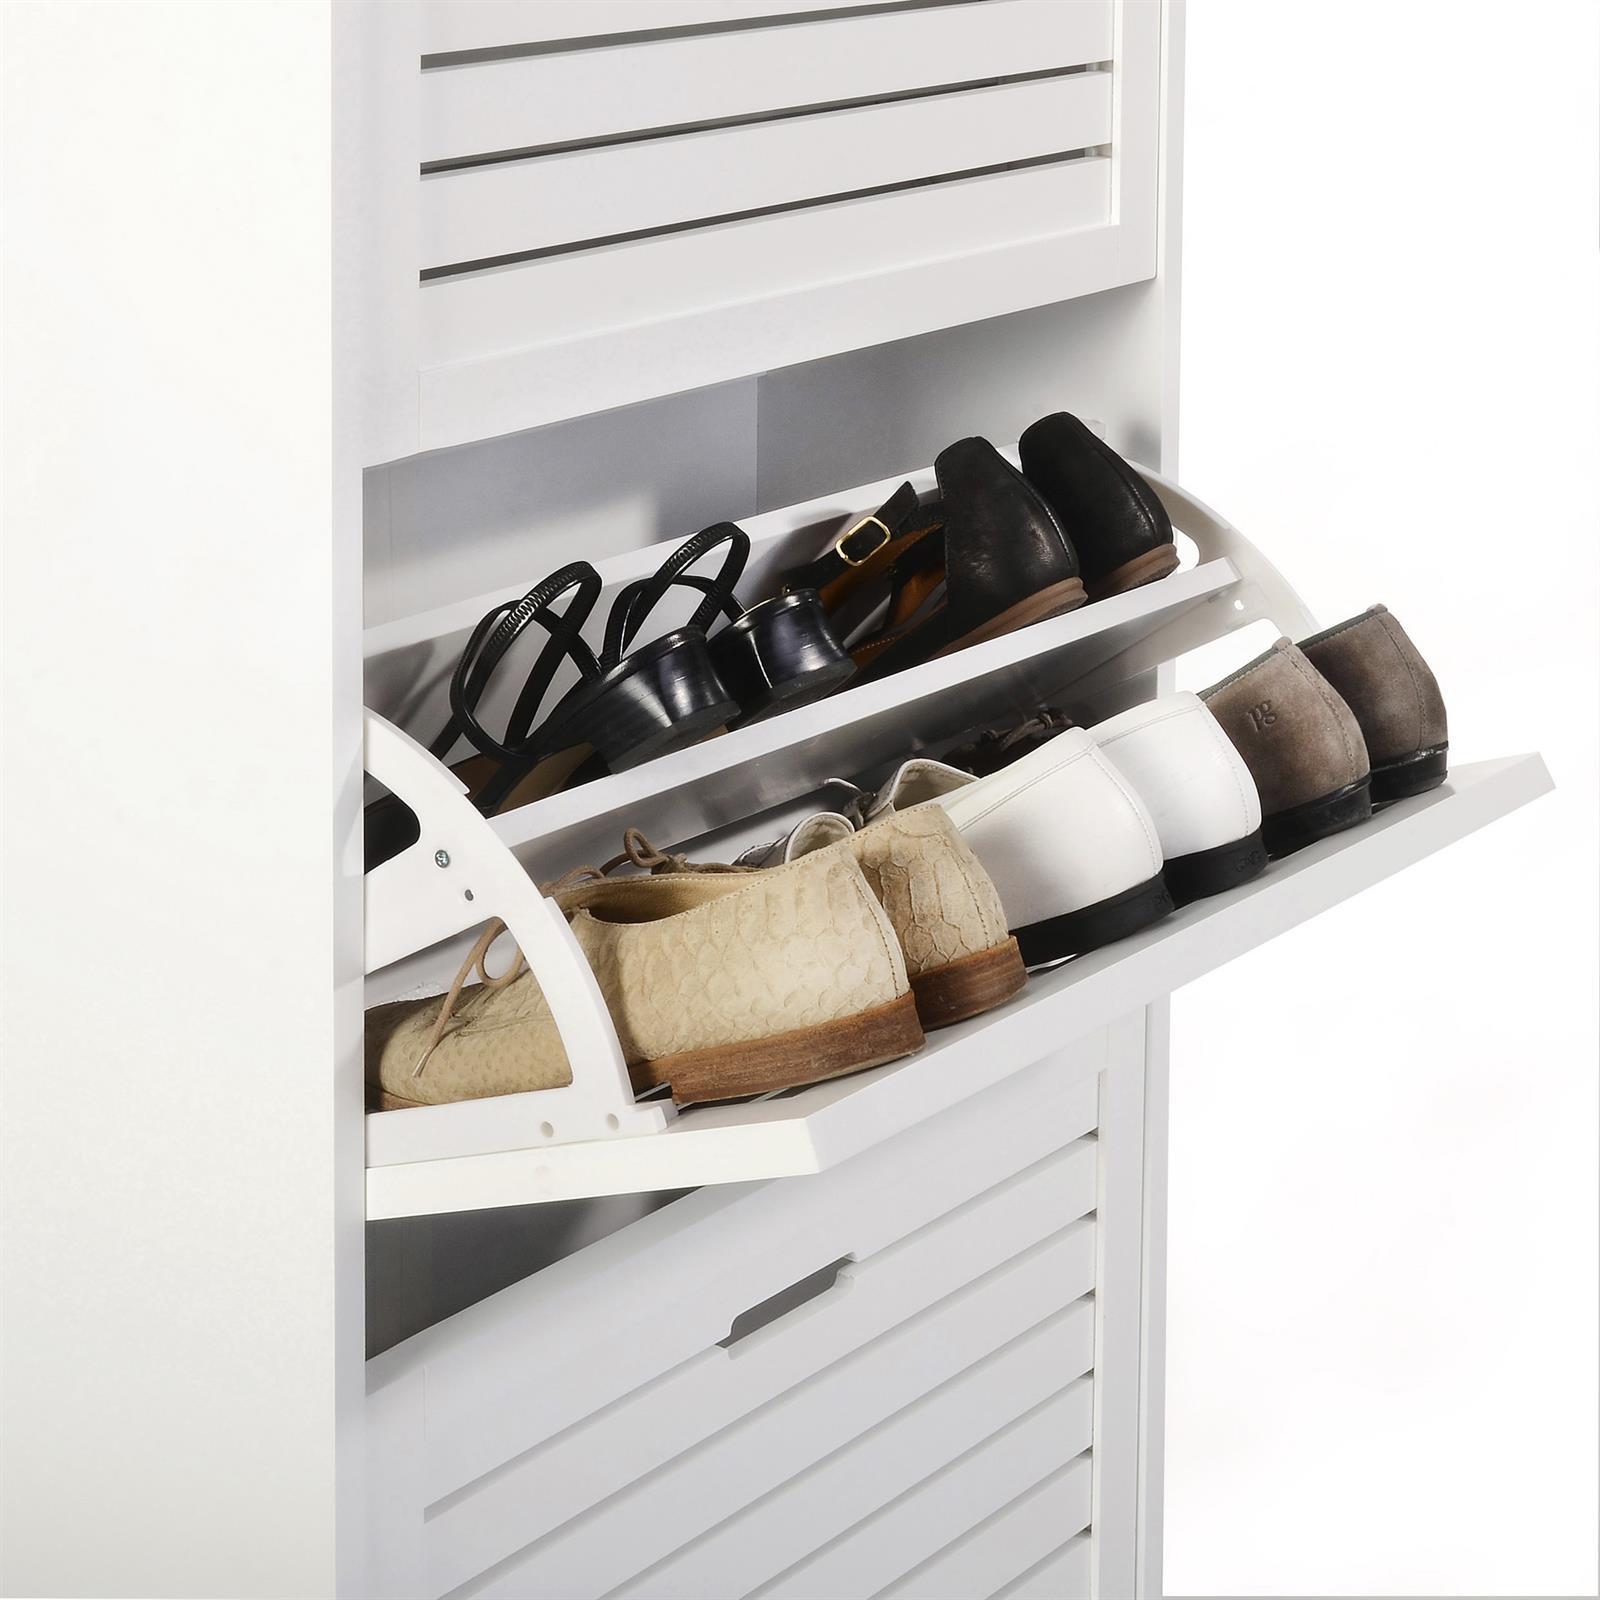 schuhkipper adria in wei mit 3 klappen mobilia24. Black Bedroom Furniture Sets. Home Design Ideas